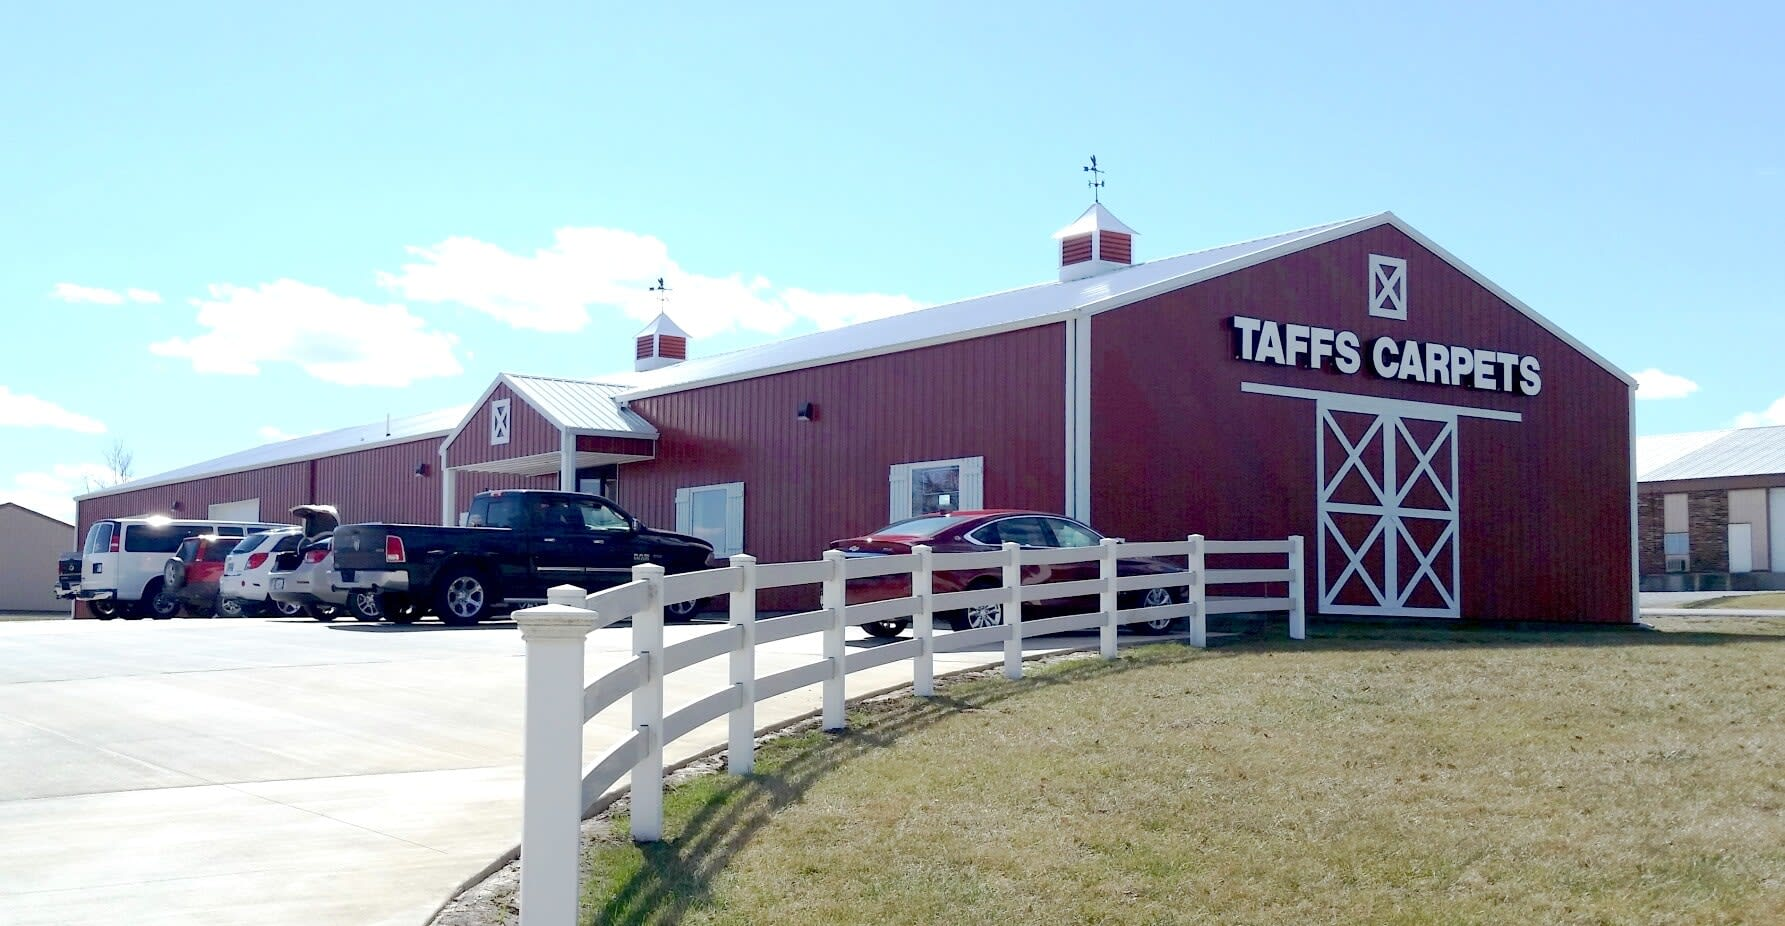 Taff's Carpets showroom in Kearney, MO